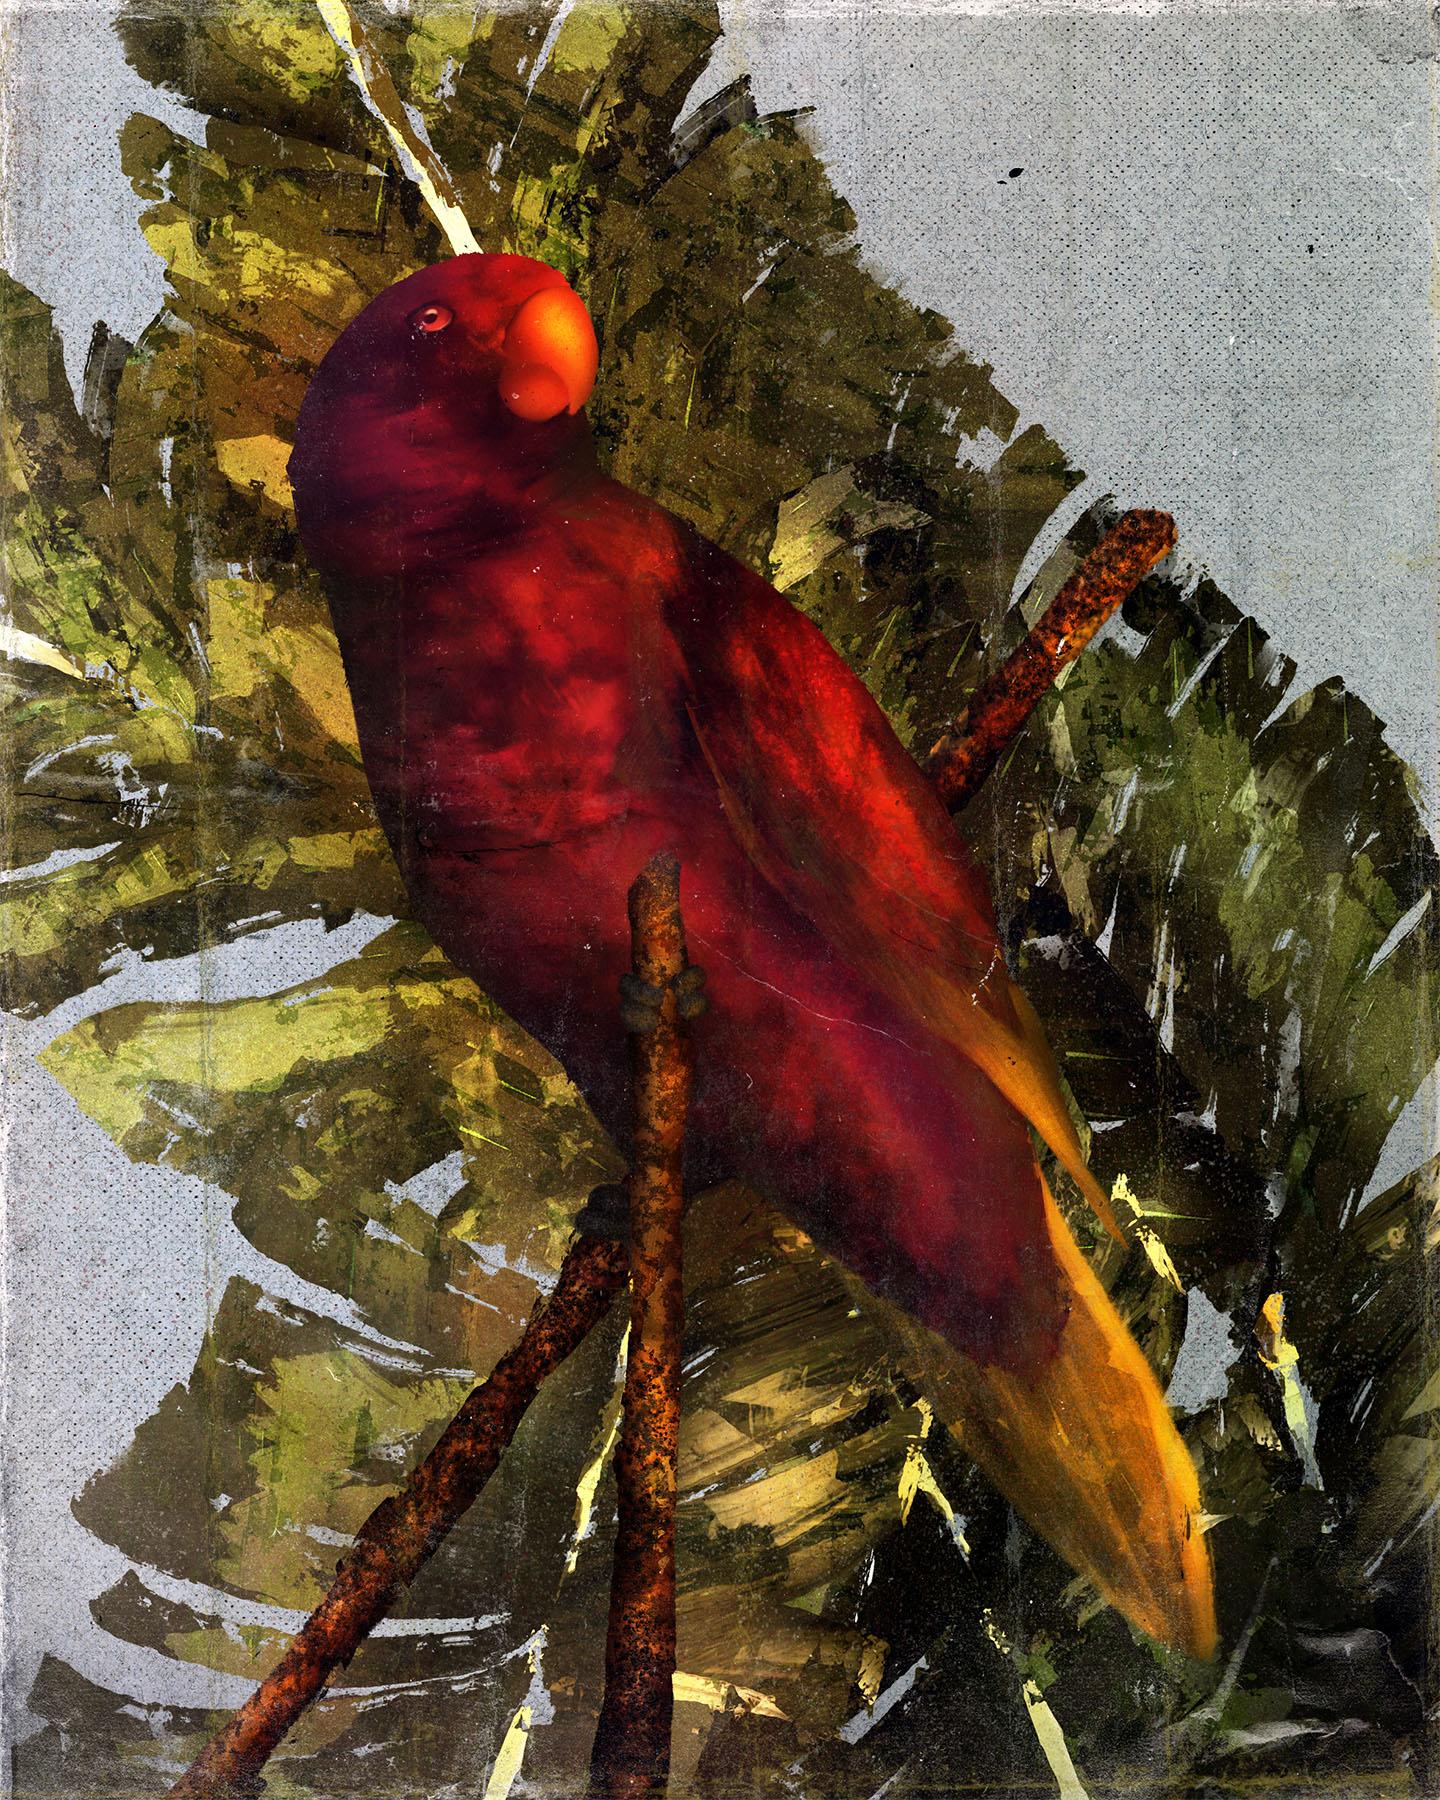 Animals_Pohnpei Lorikeet_Trichoglossus rubiginosus_Illustration_Julie Smits.jpg